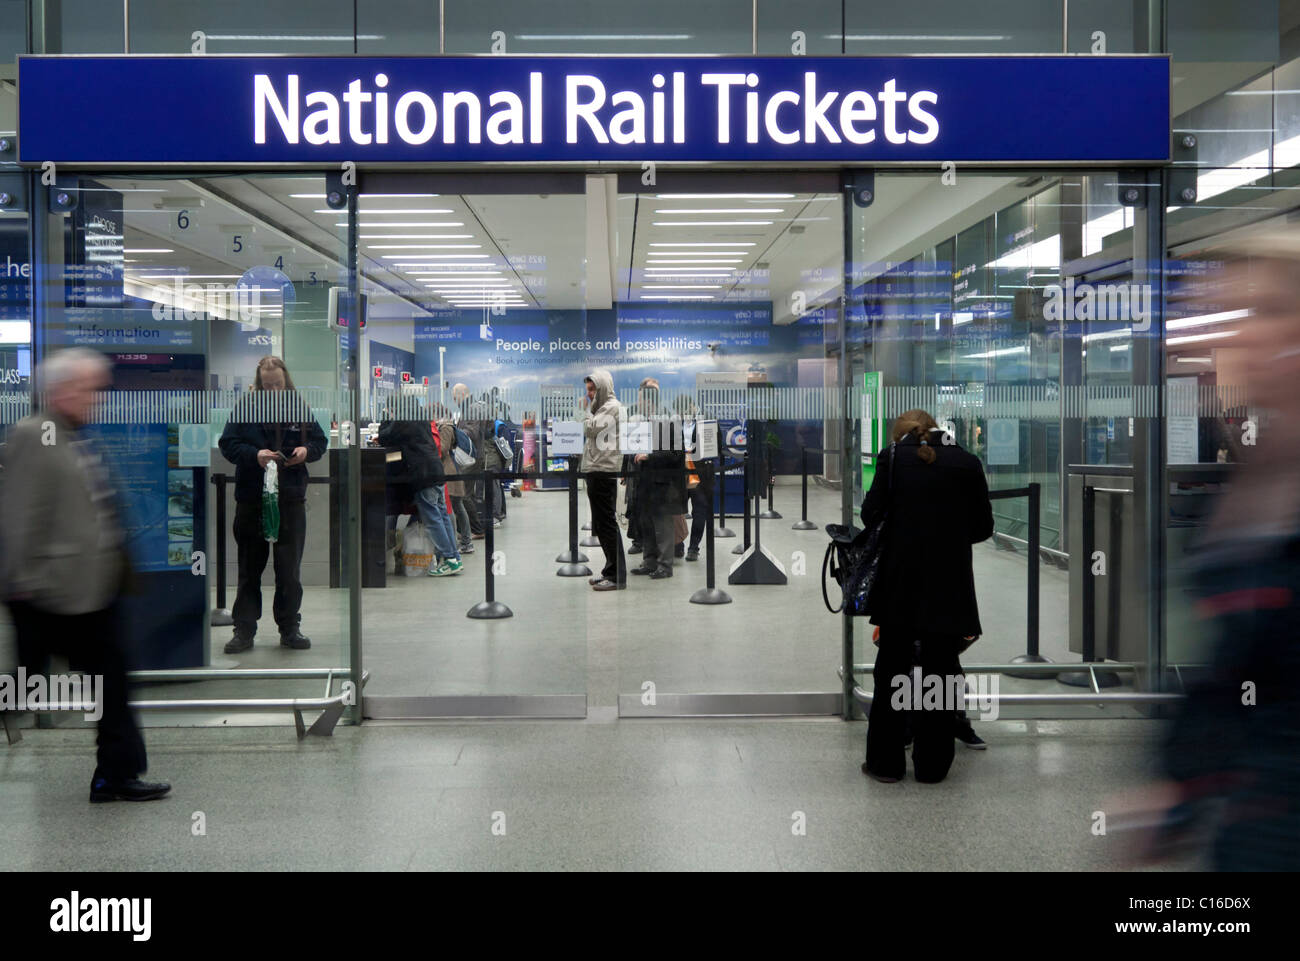 National Rail Ticket Office - St Pancras Station - London - Stock Image